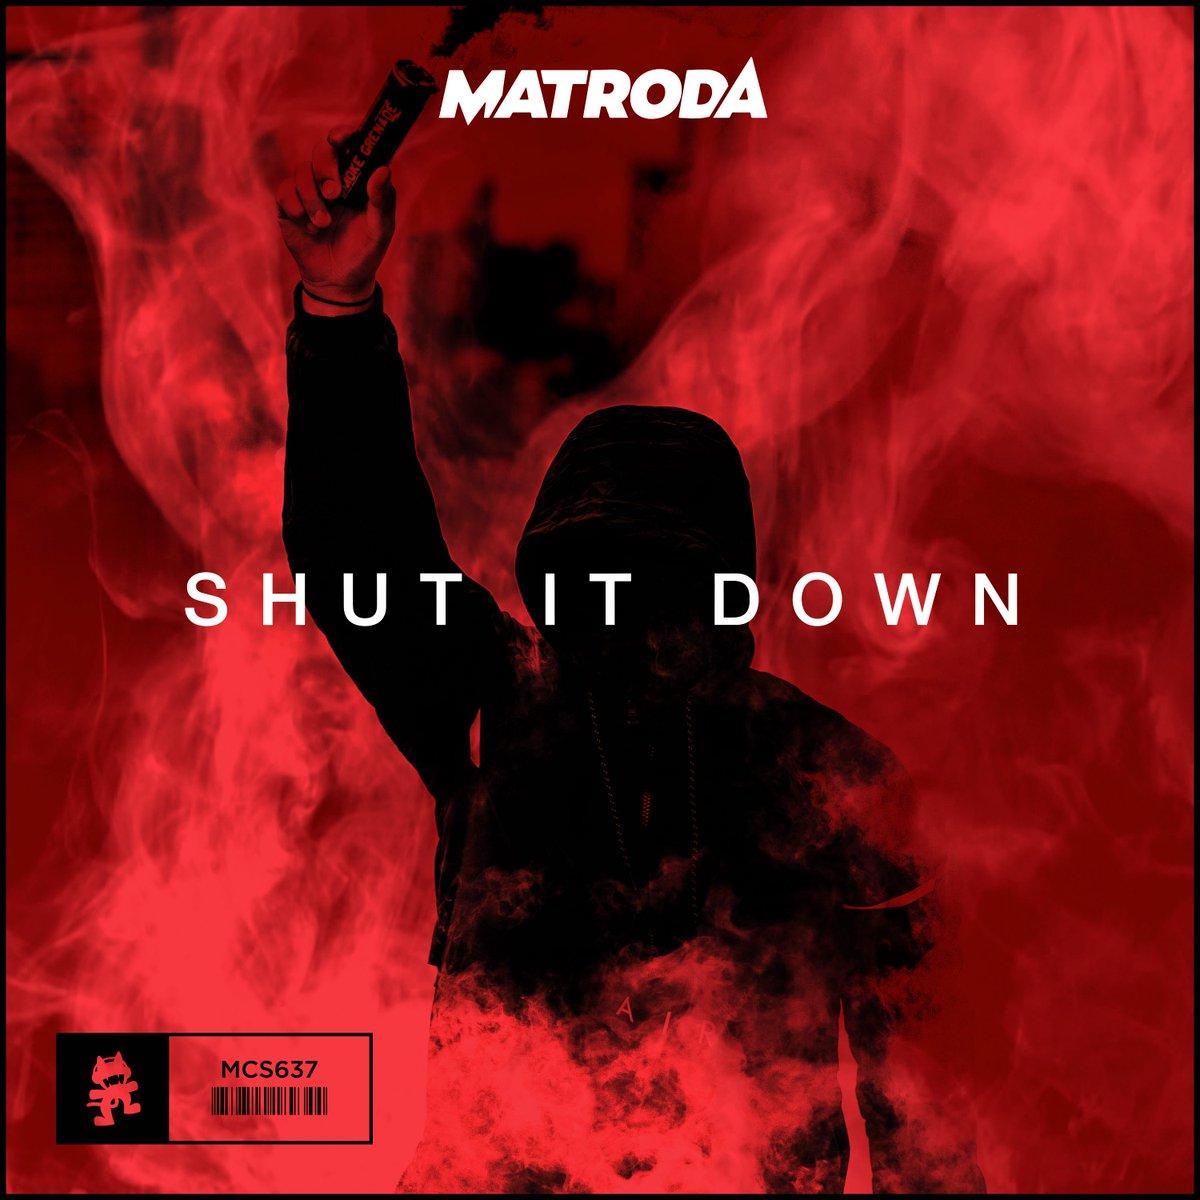 Shut It Down (Matroda)